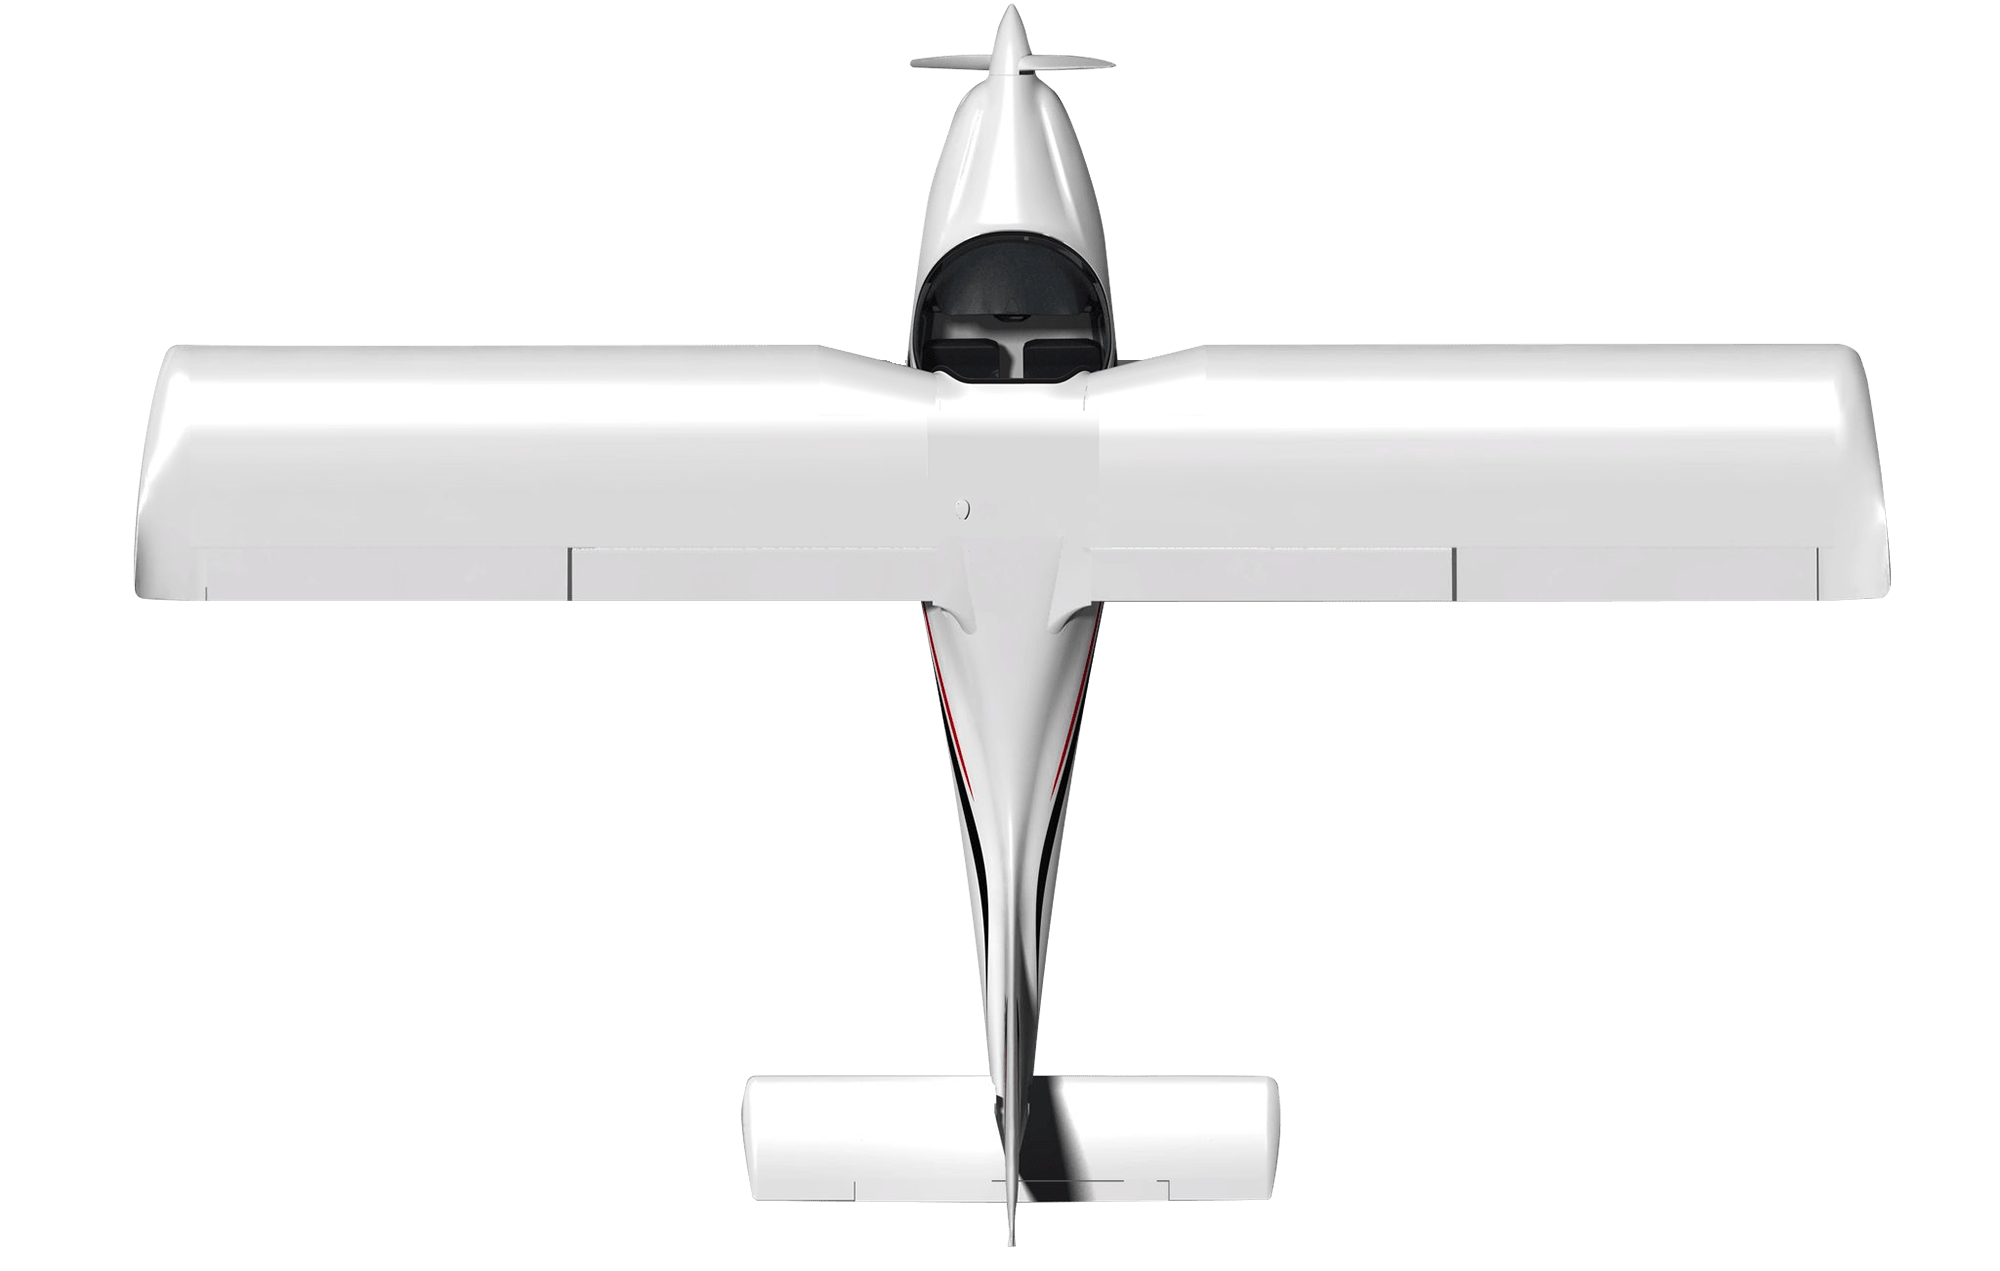 P92 Echo MkII